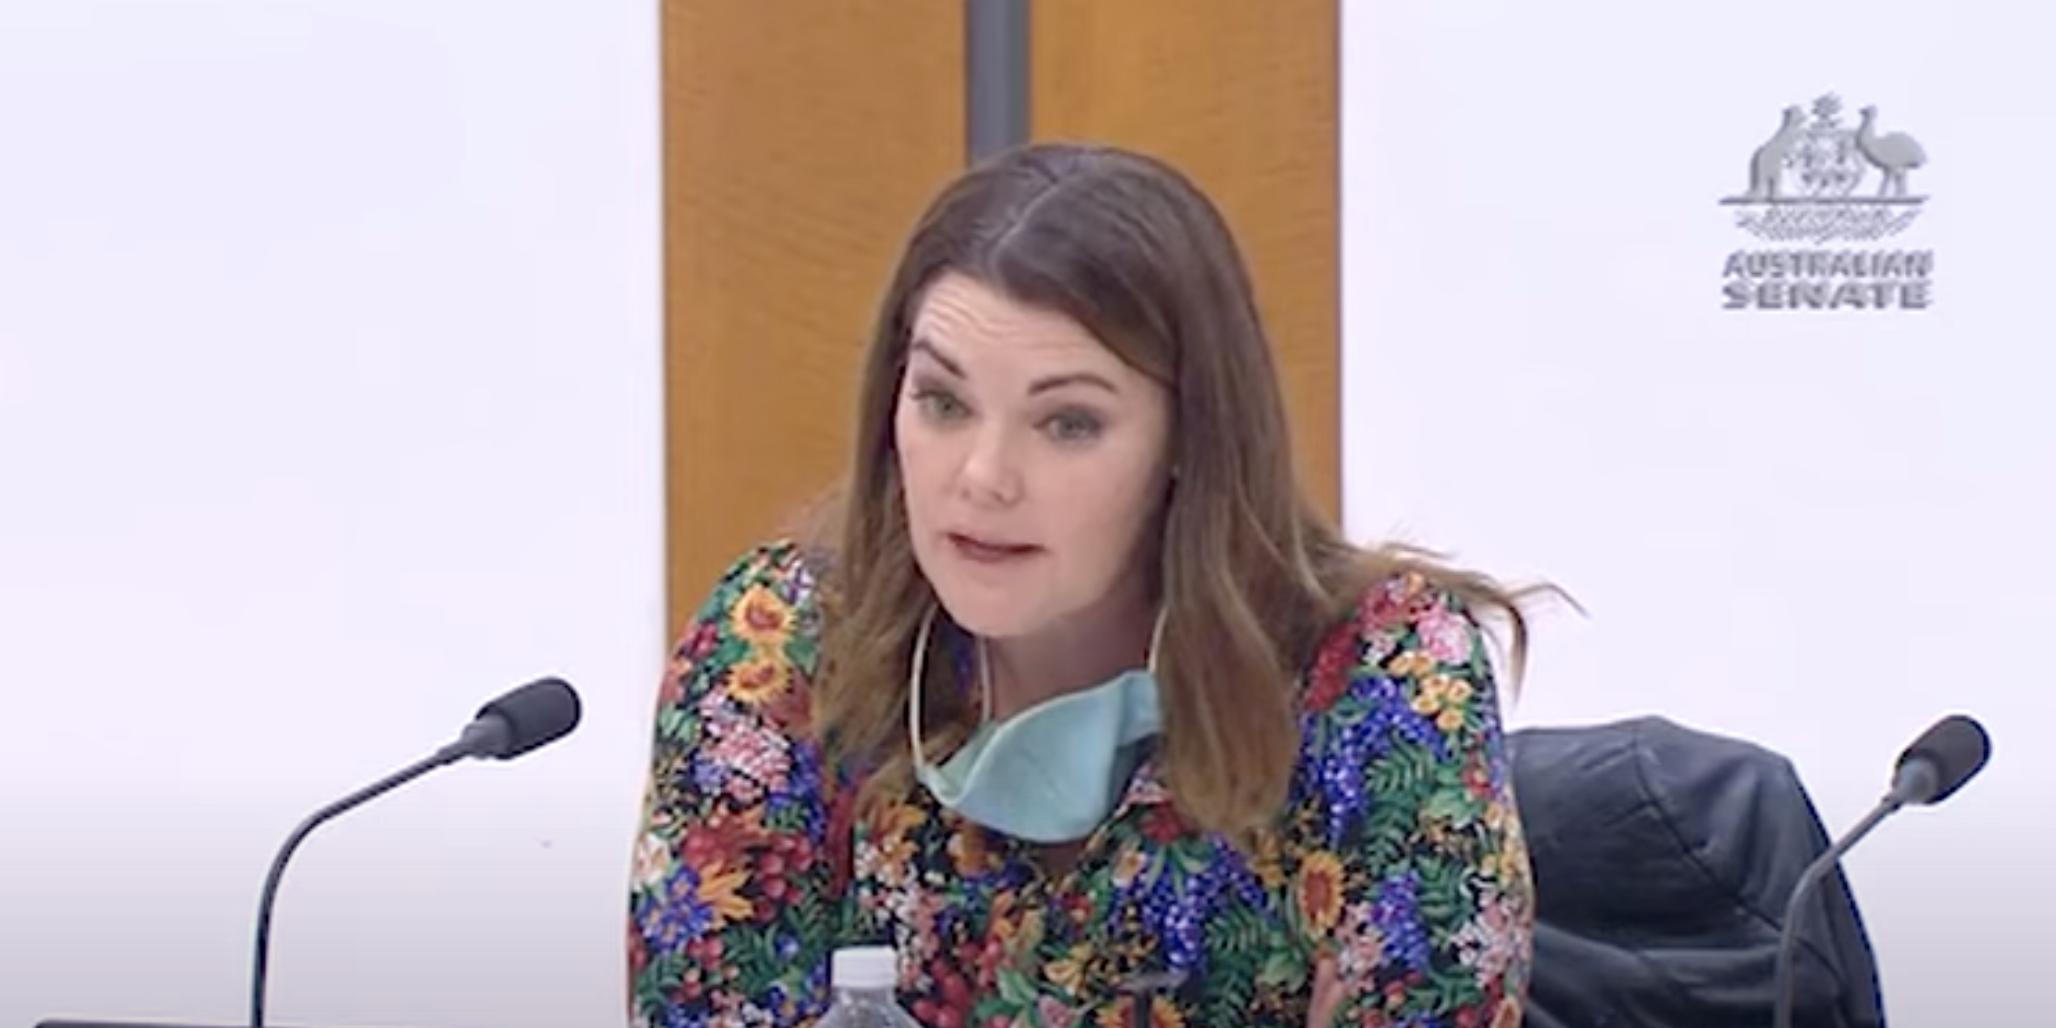 Sky News Australia subjected to far-left 'media diversity inquiry'